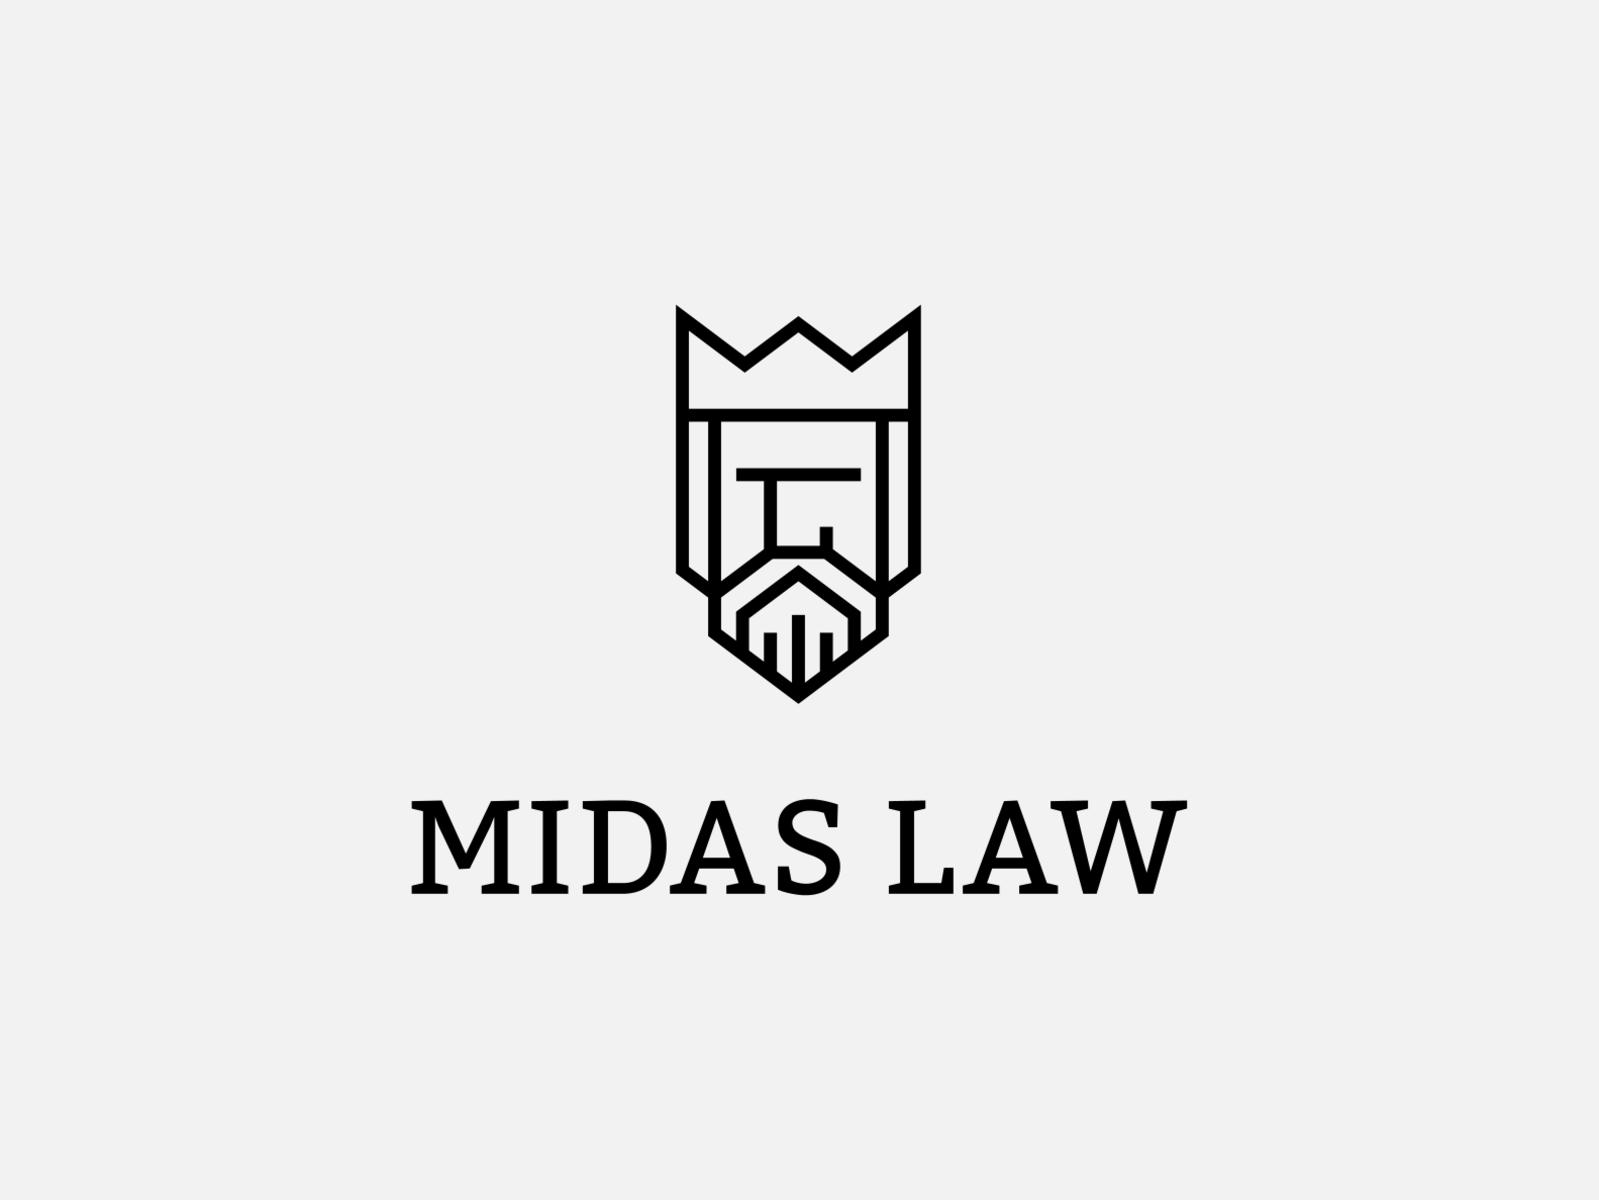 Midas Law logo design